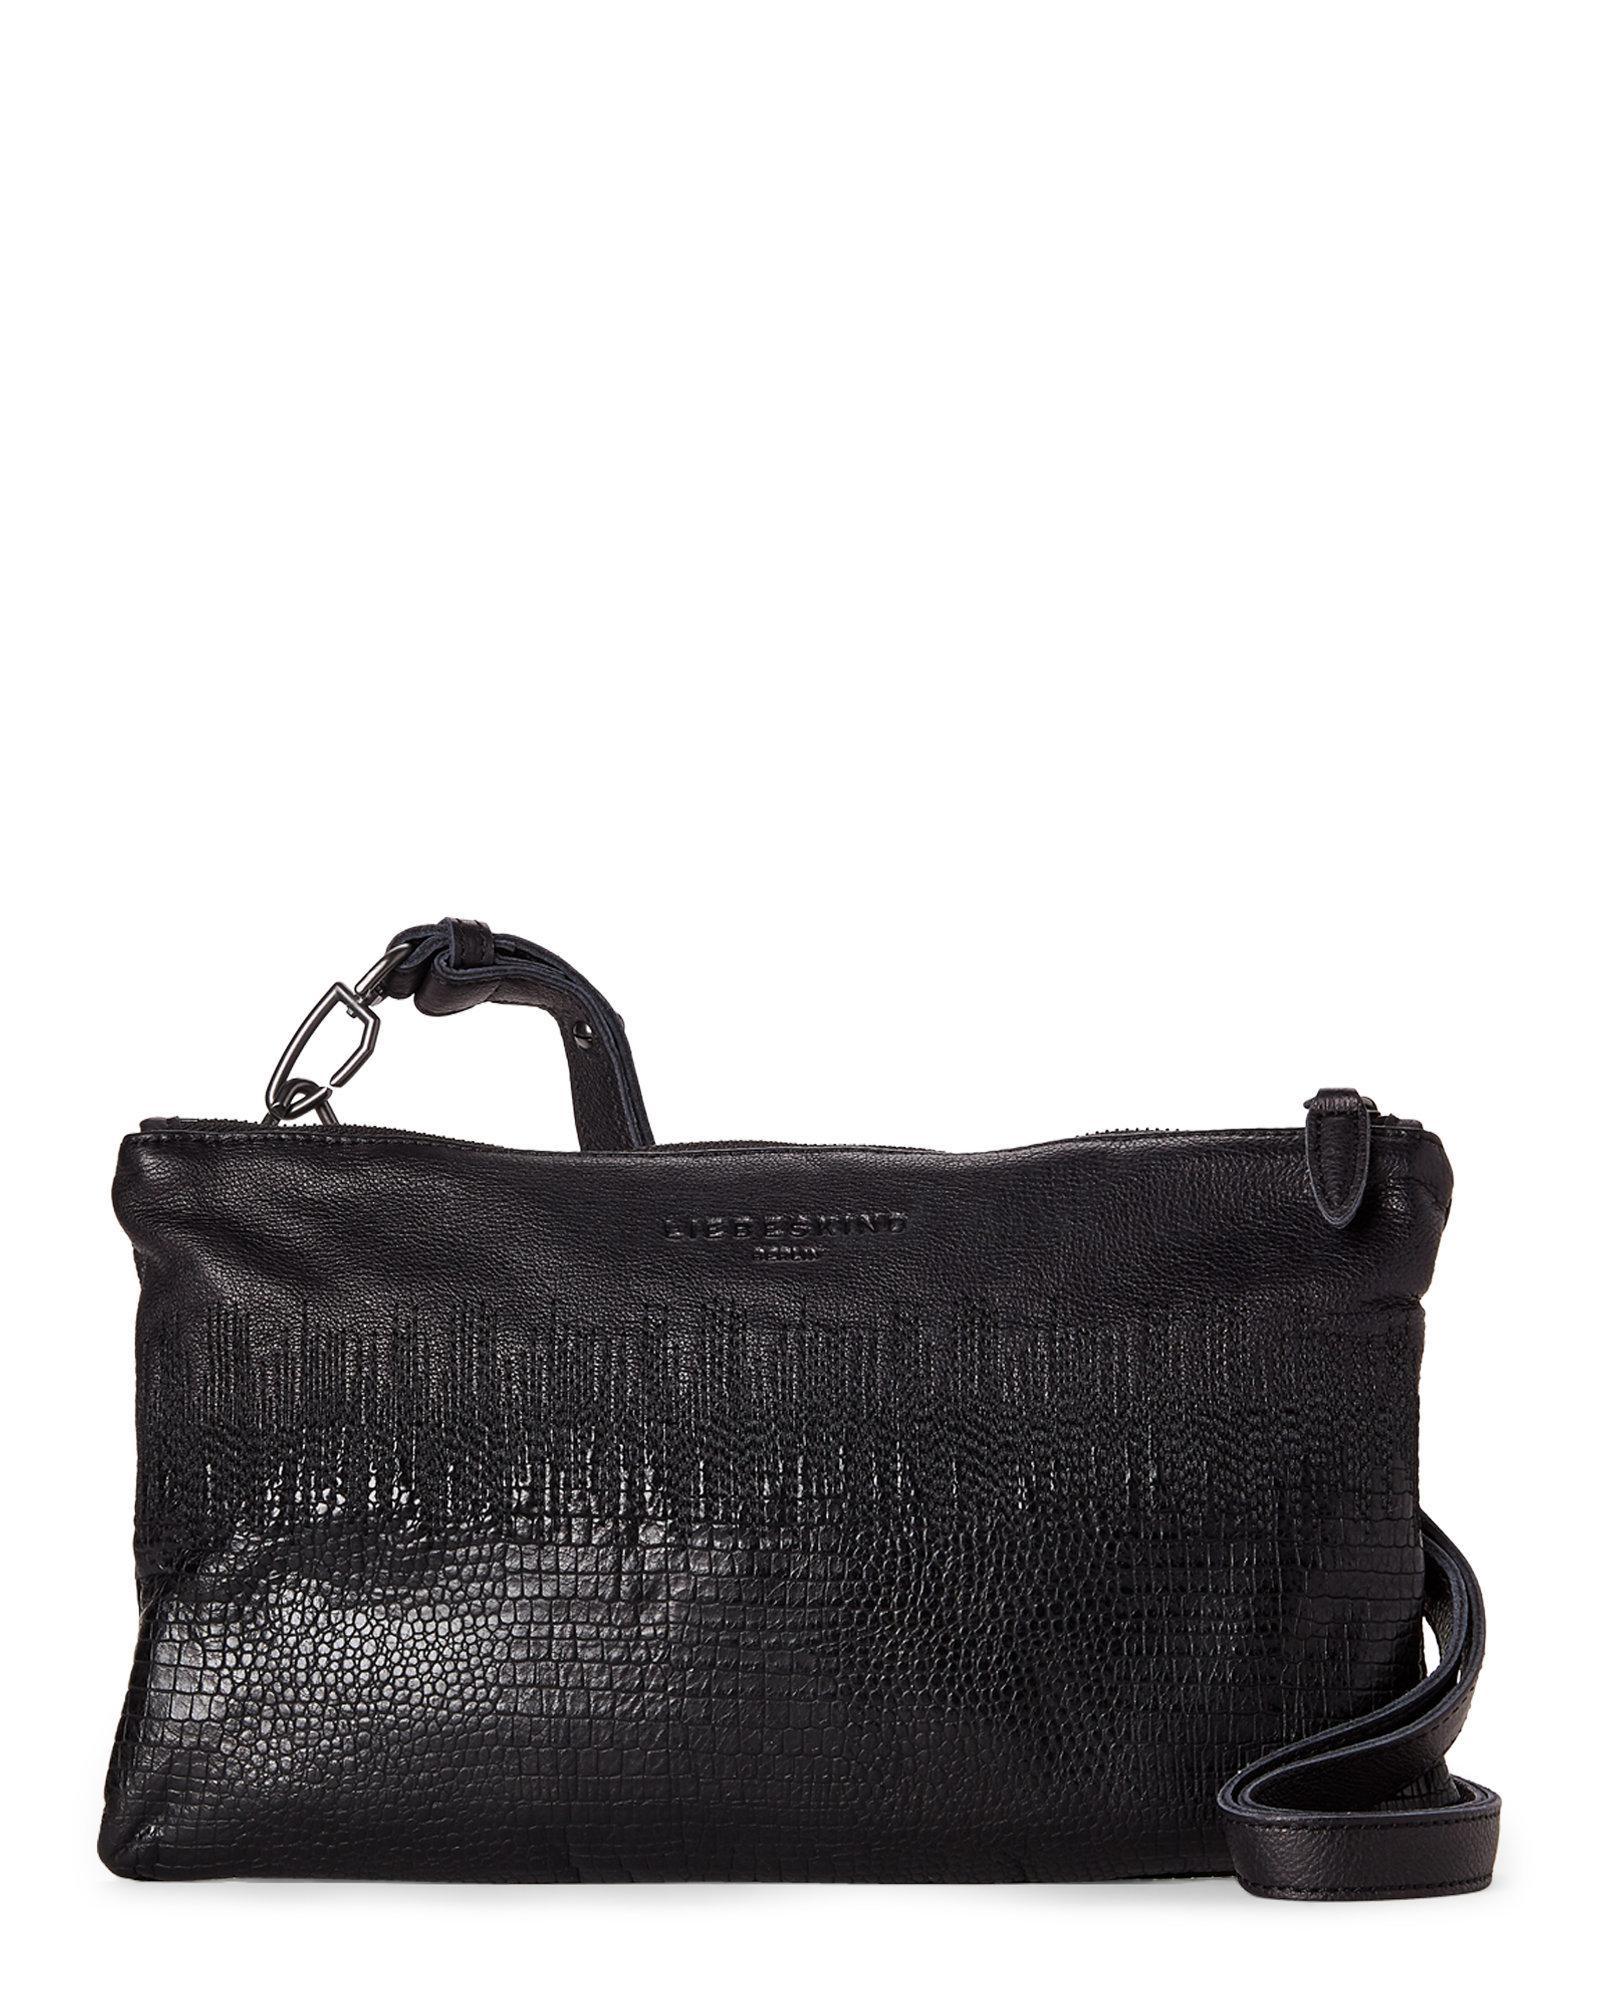 eb22fe36cdf00 Liebeskind Nairobi Black Jamba Lizard Embossed Shoulder Bag in Black ...